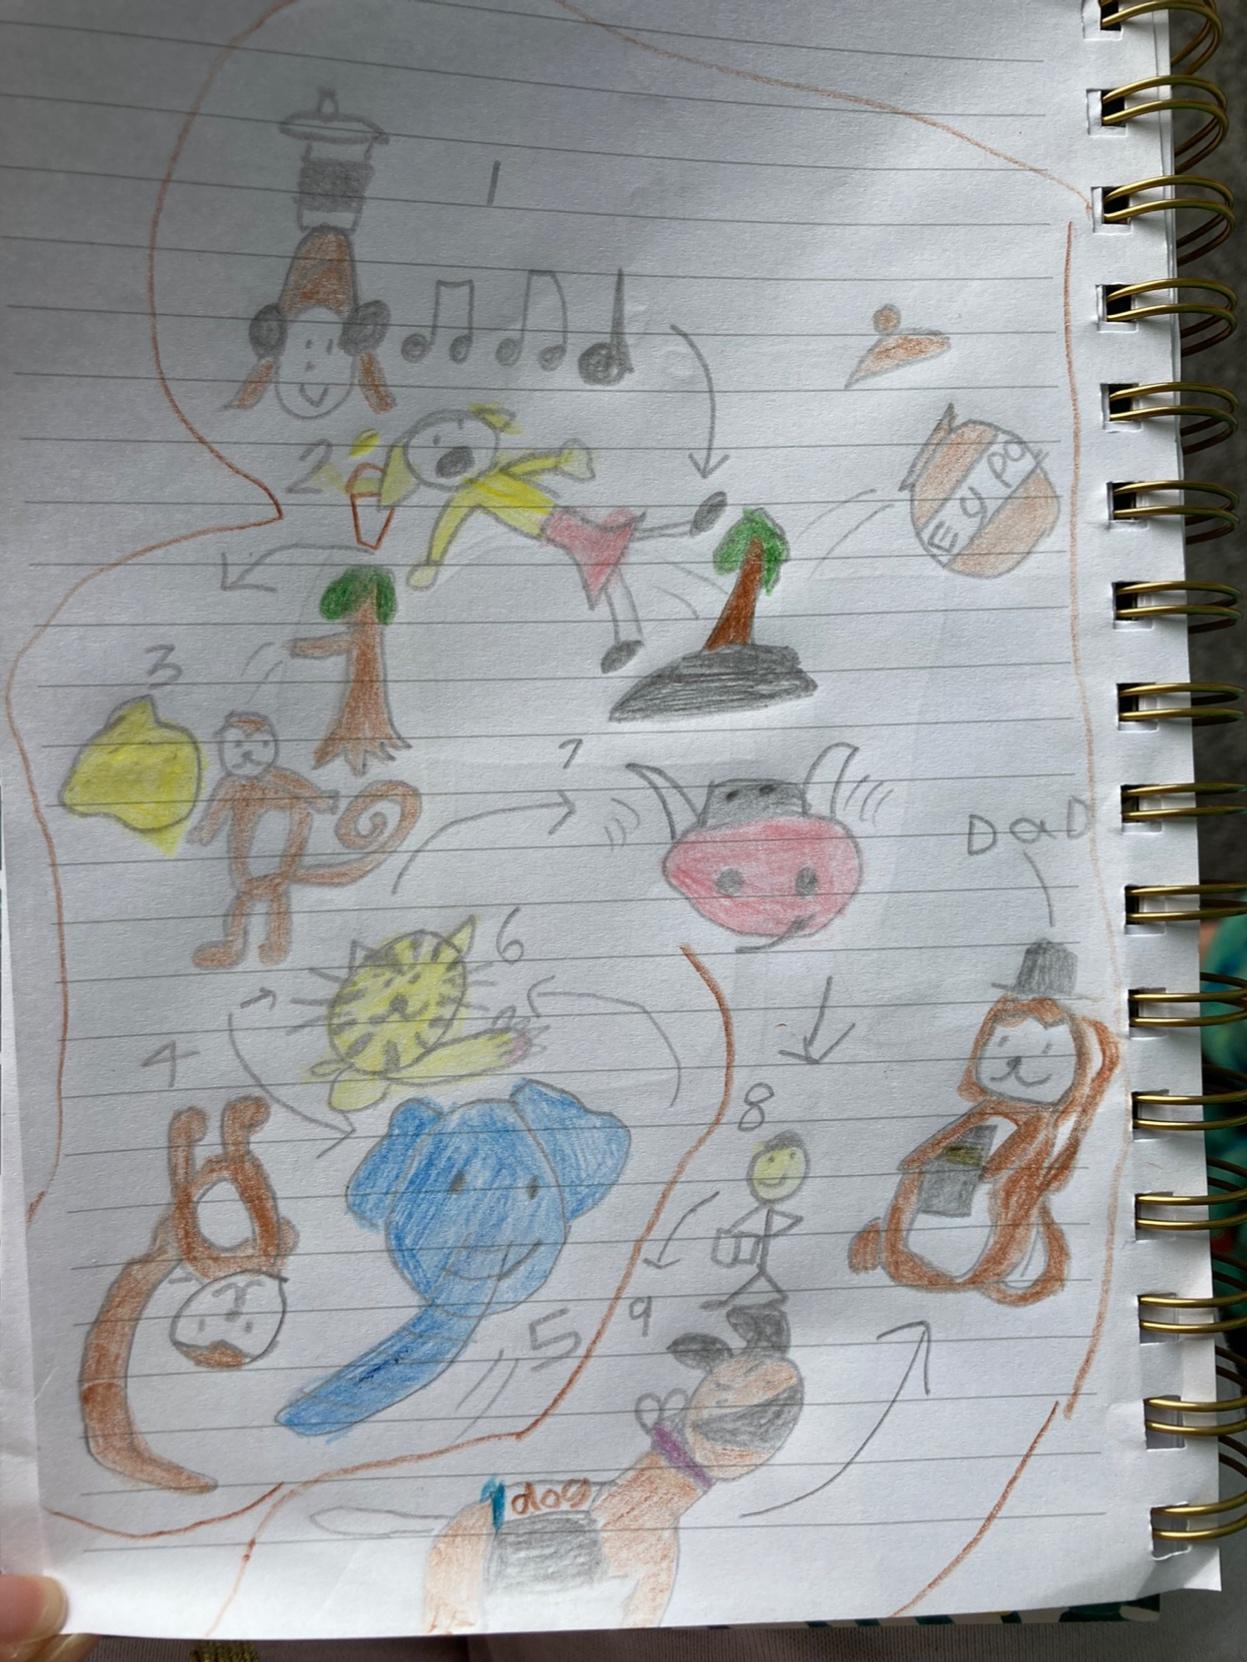 Desmond's brilliant story map!